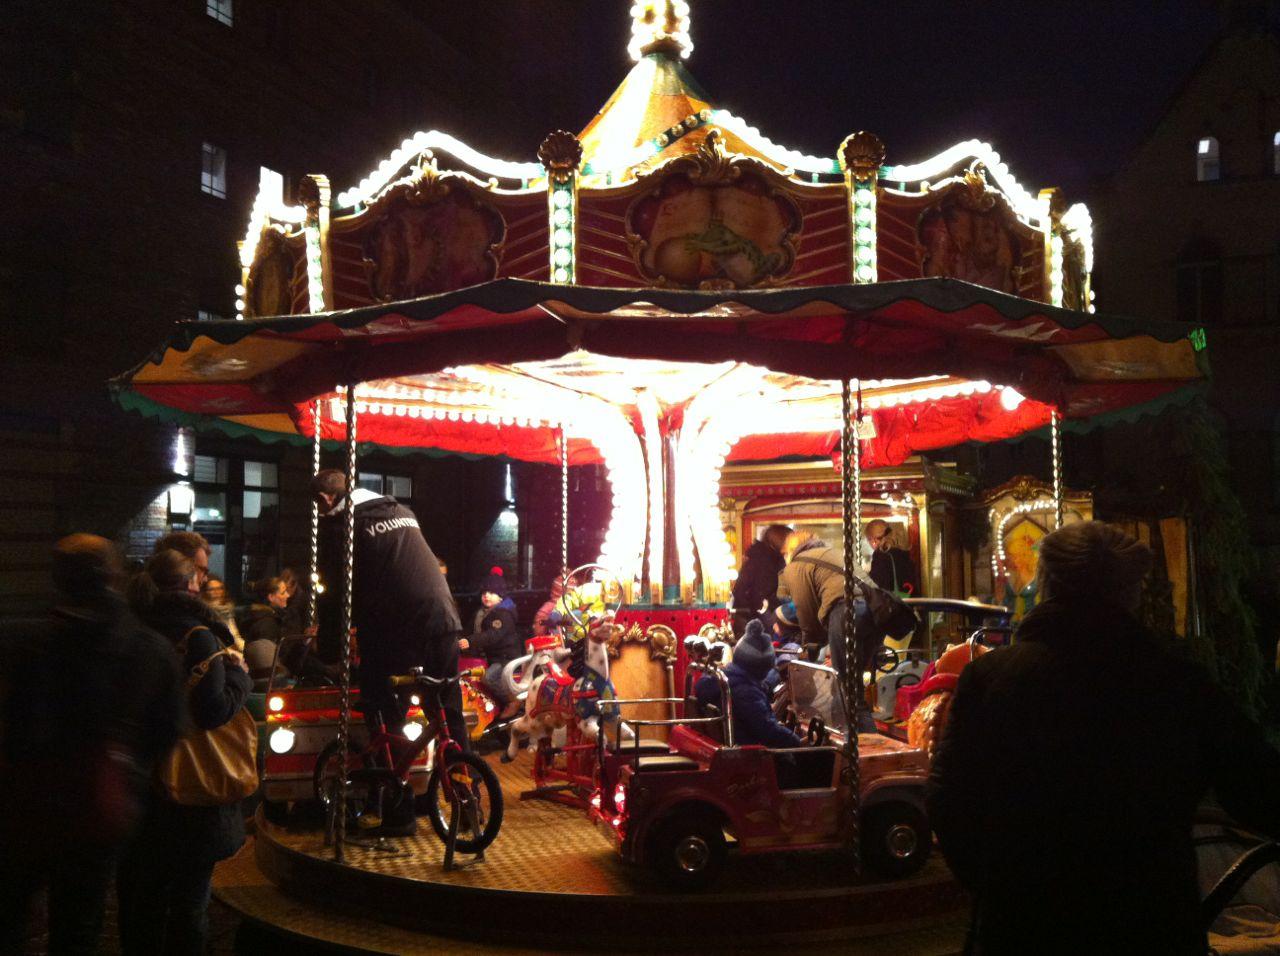 Lucia Christmas market, Berlin